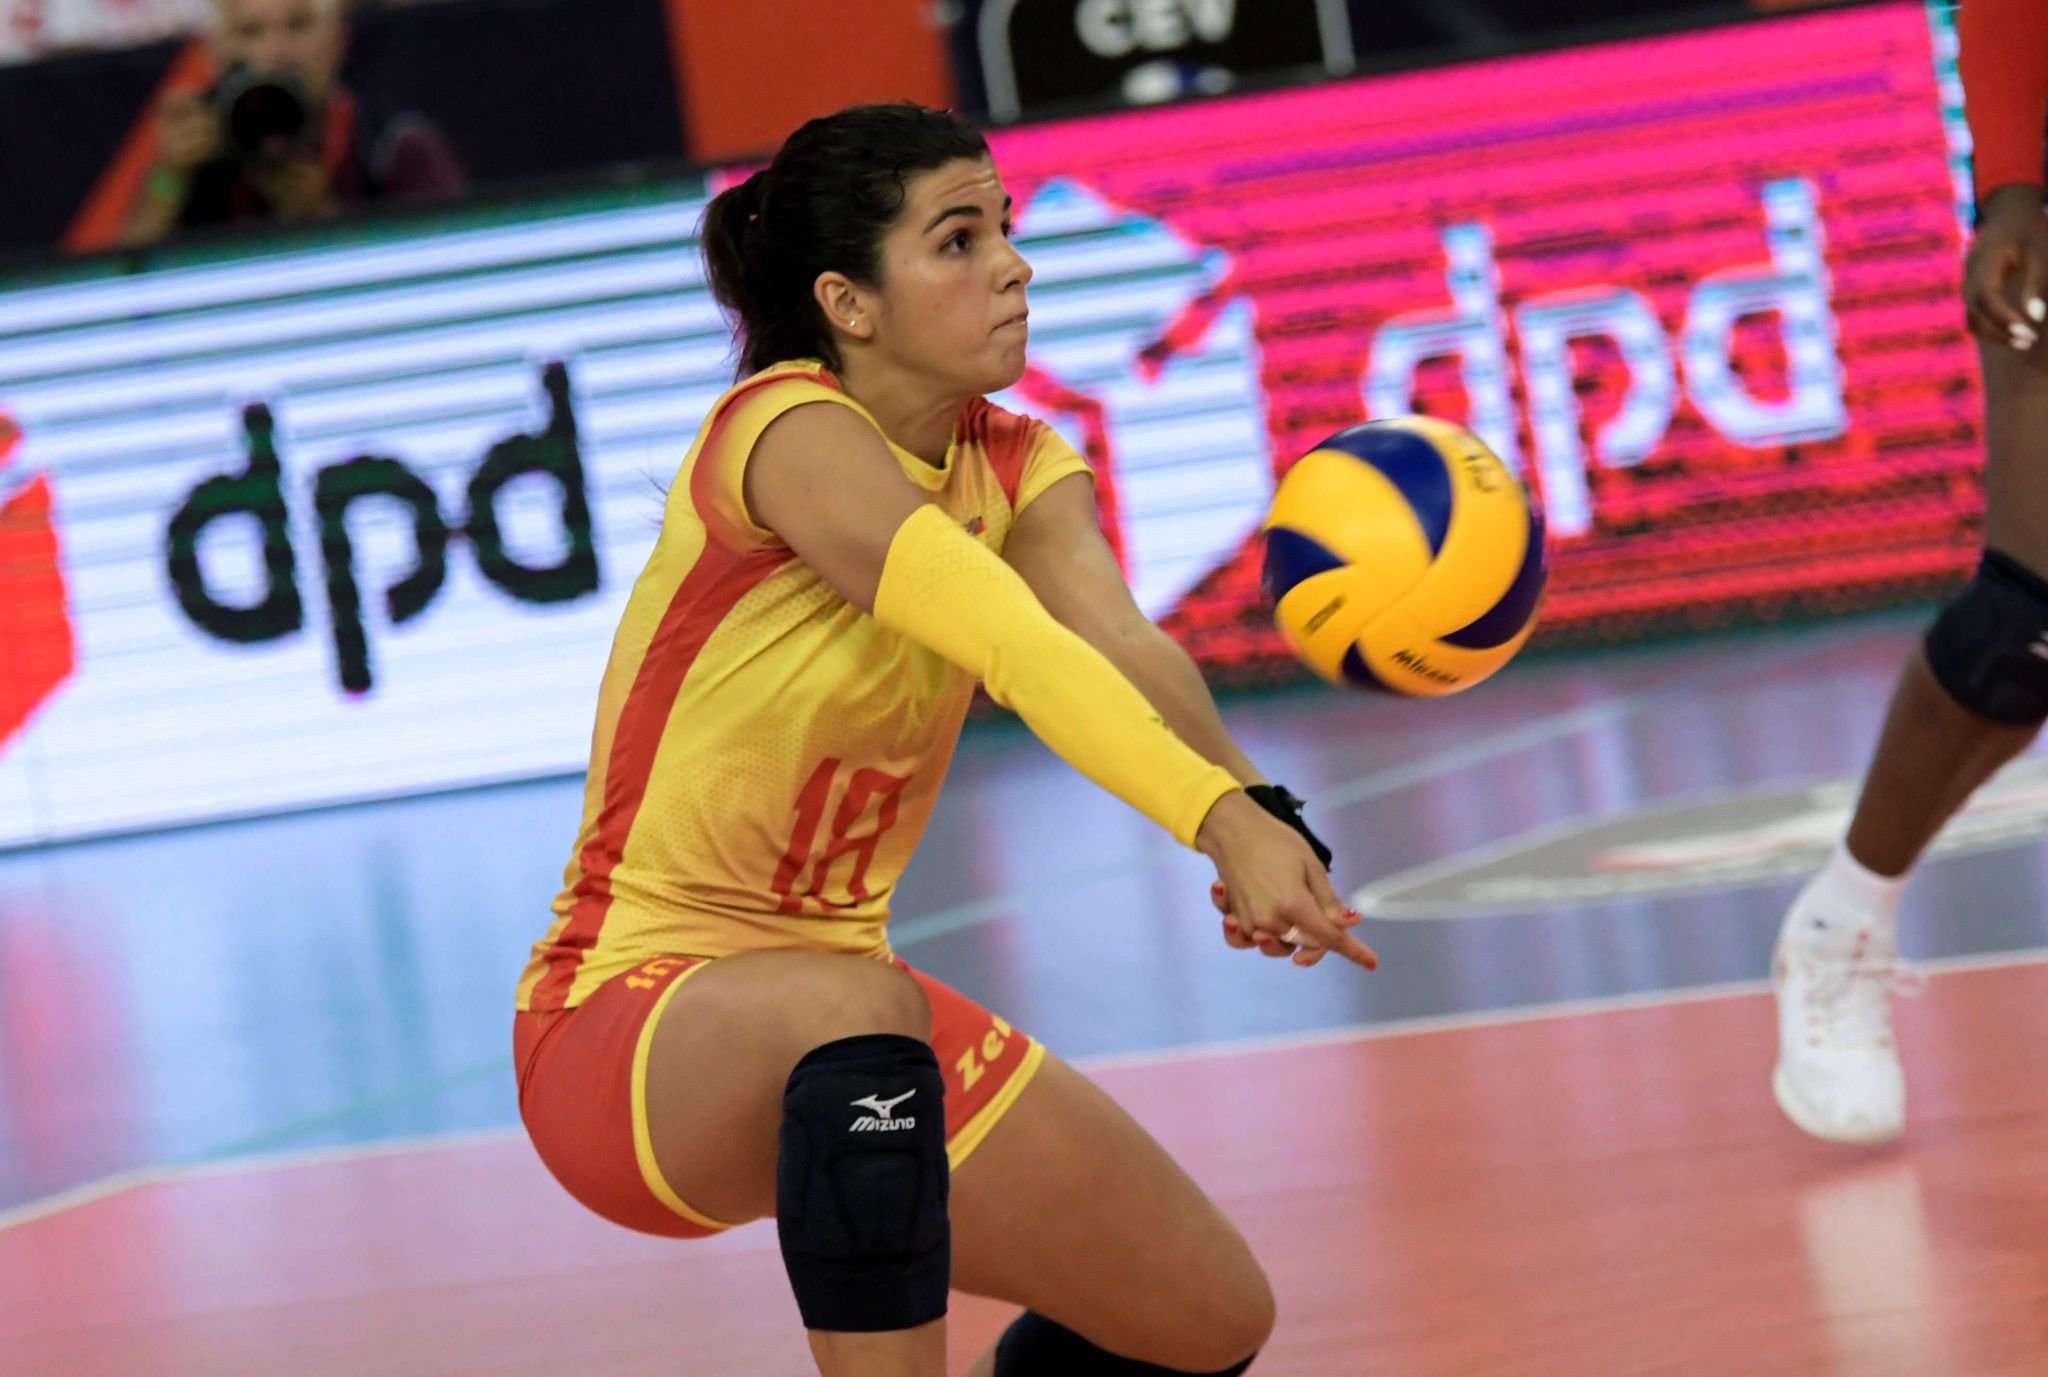 mizuno volleyball online shop europe en espa�ol roma espa�a